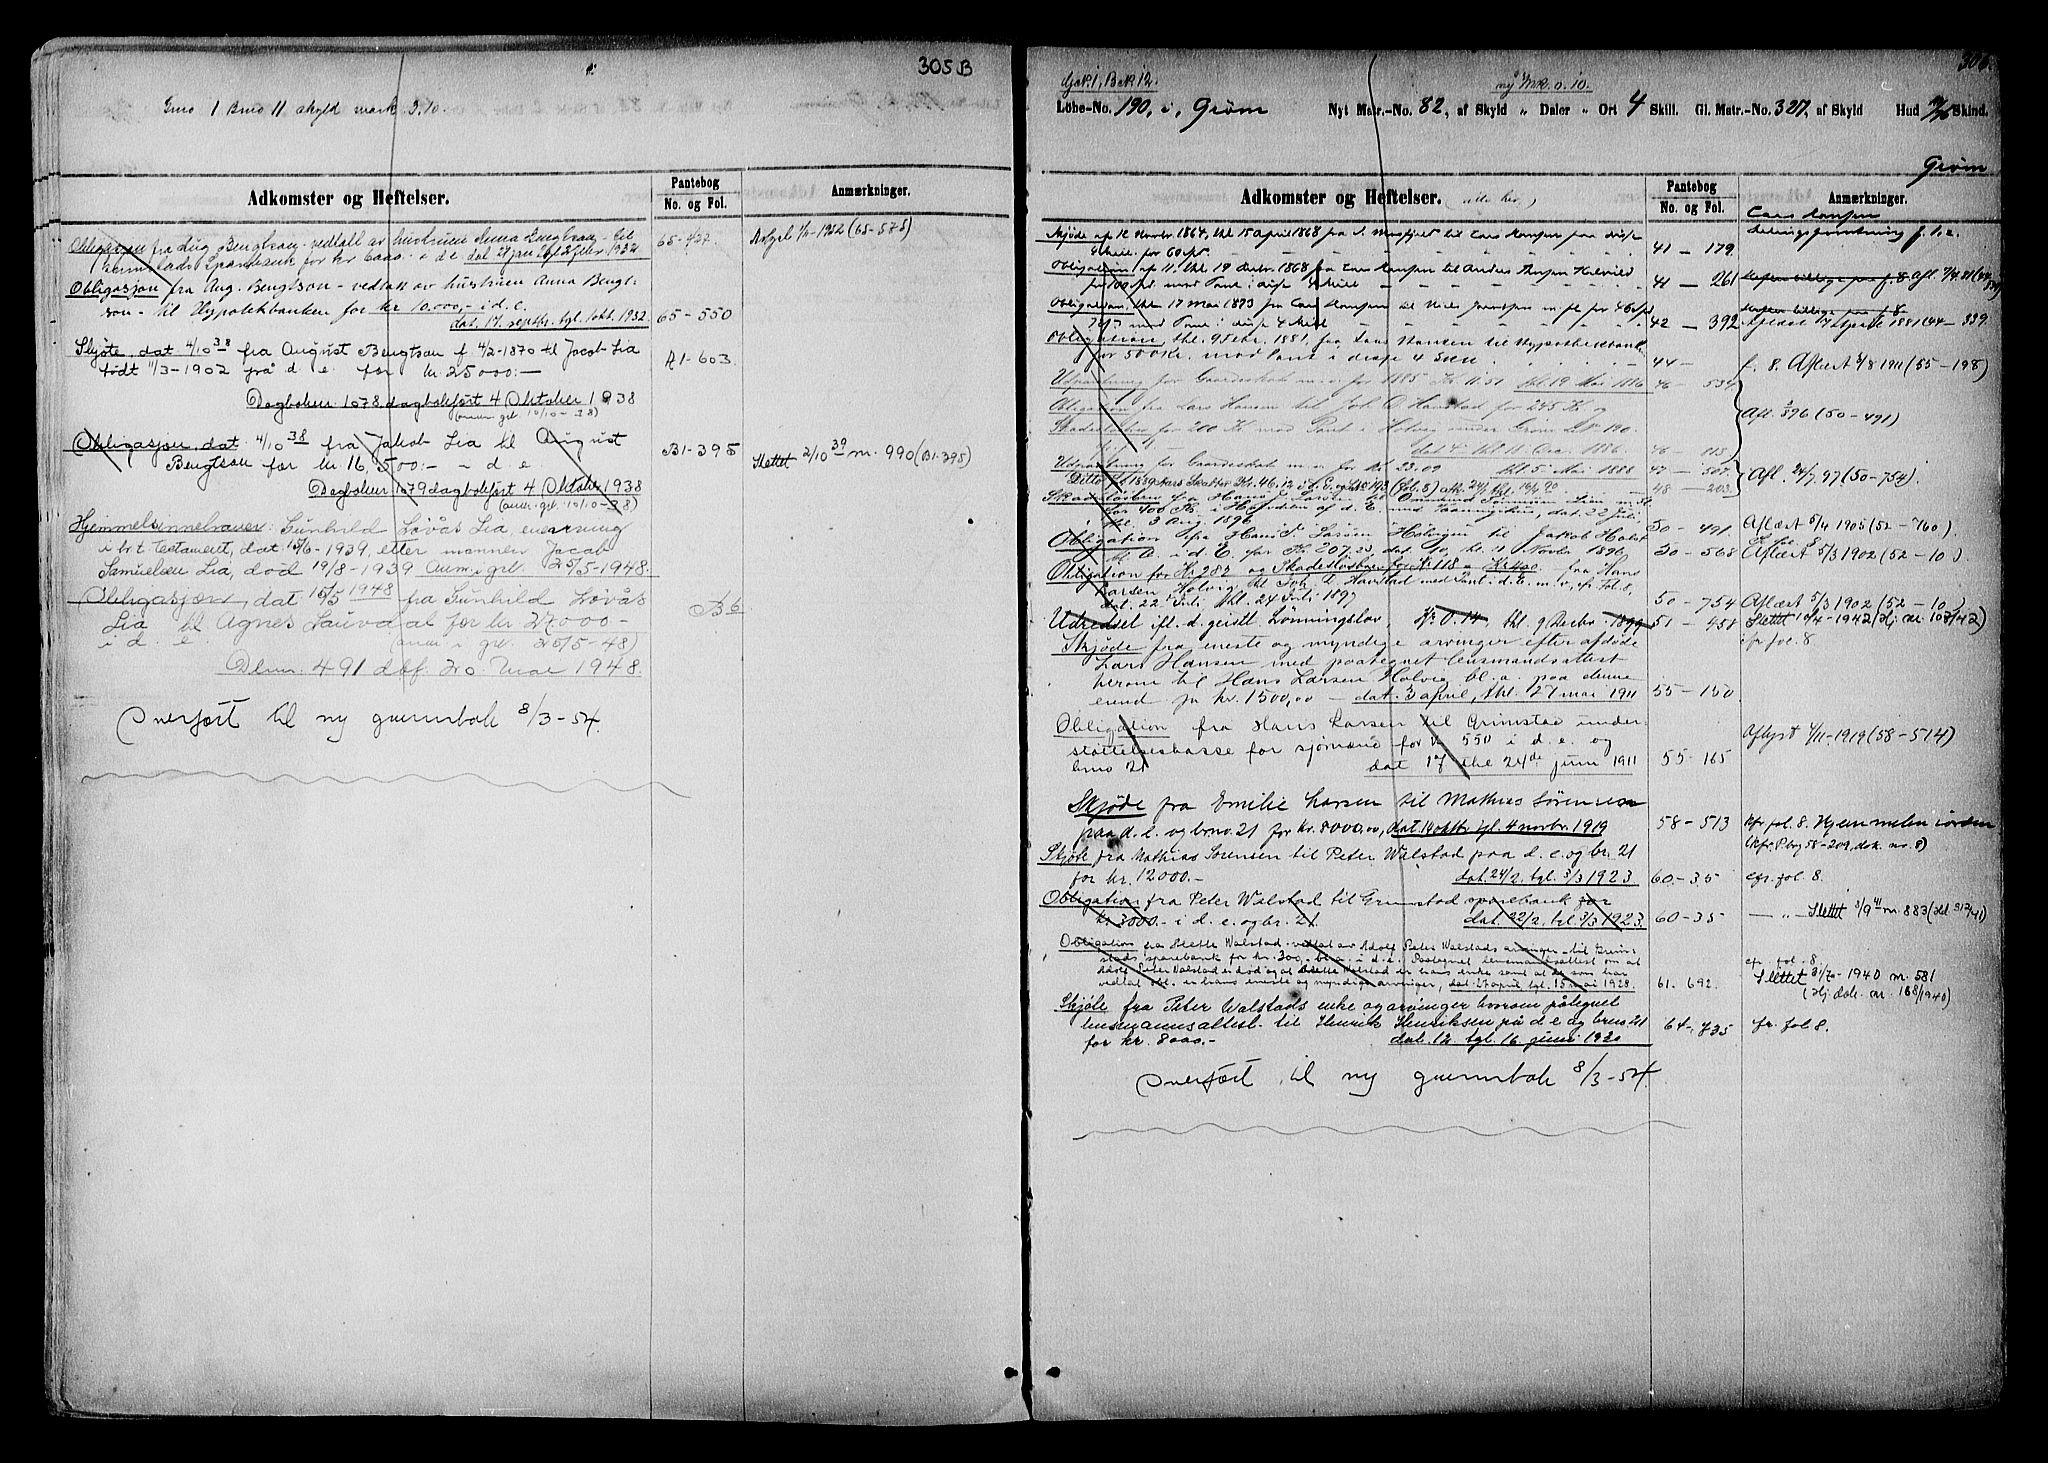 SAK, Vestre Nedenes/Sand sorenskriveri, G/Ga/L0016: Panteregister nr. 12b, 1770-1957, s. 306